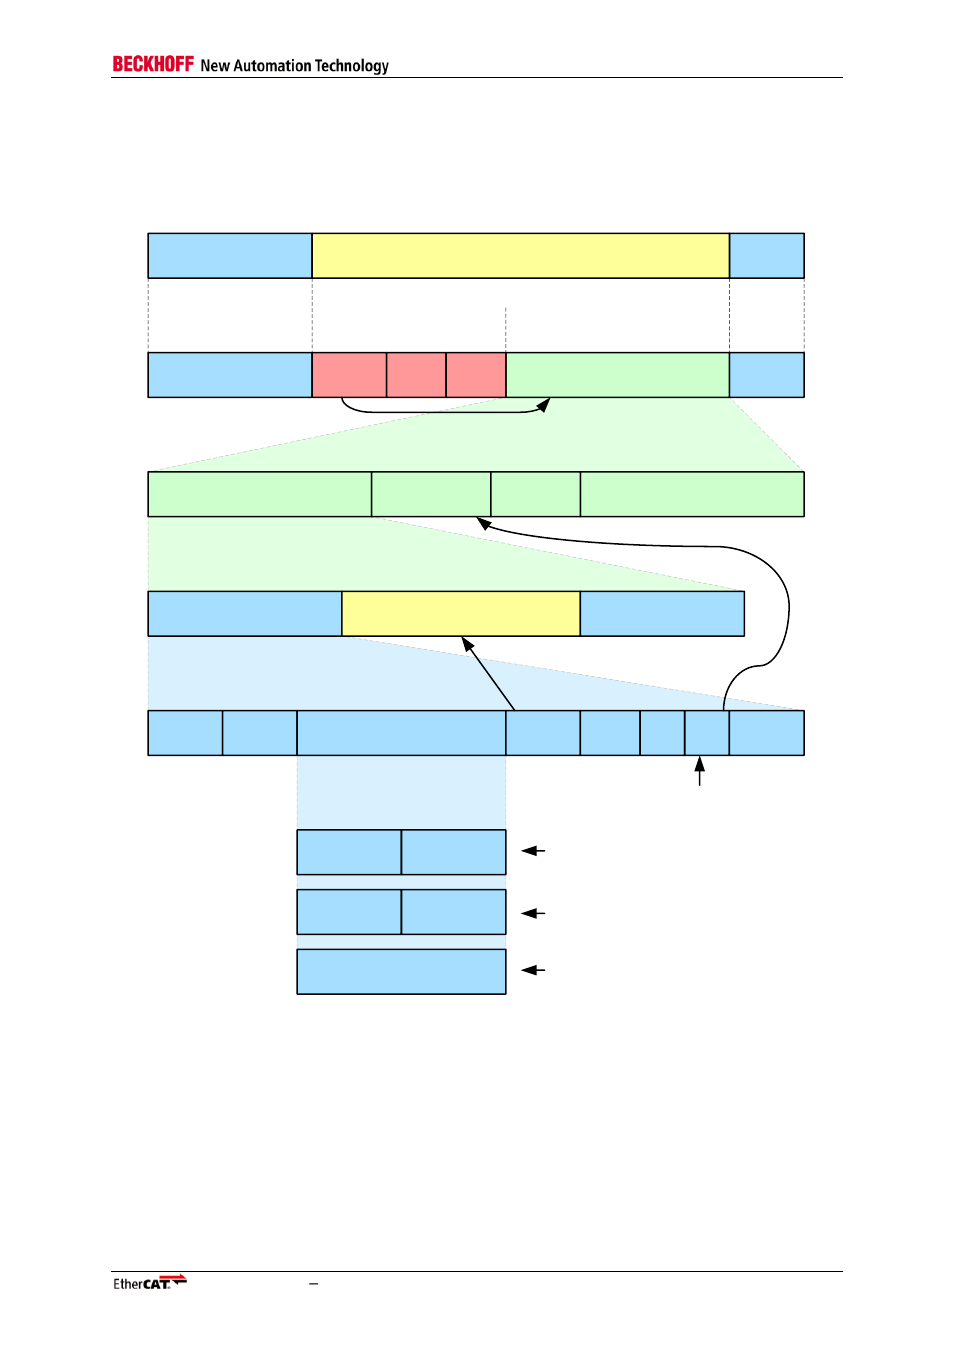 2 ethercat datagram, Ethercat datagram, Figure 3: ethercat datagram